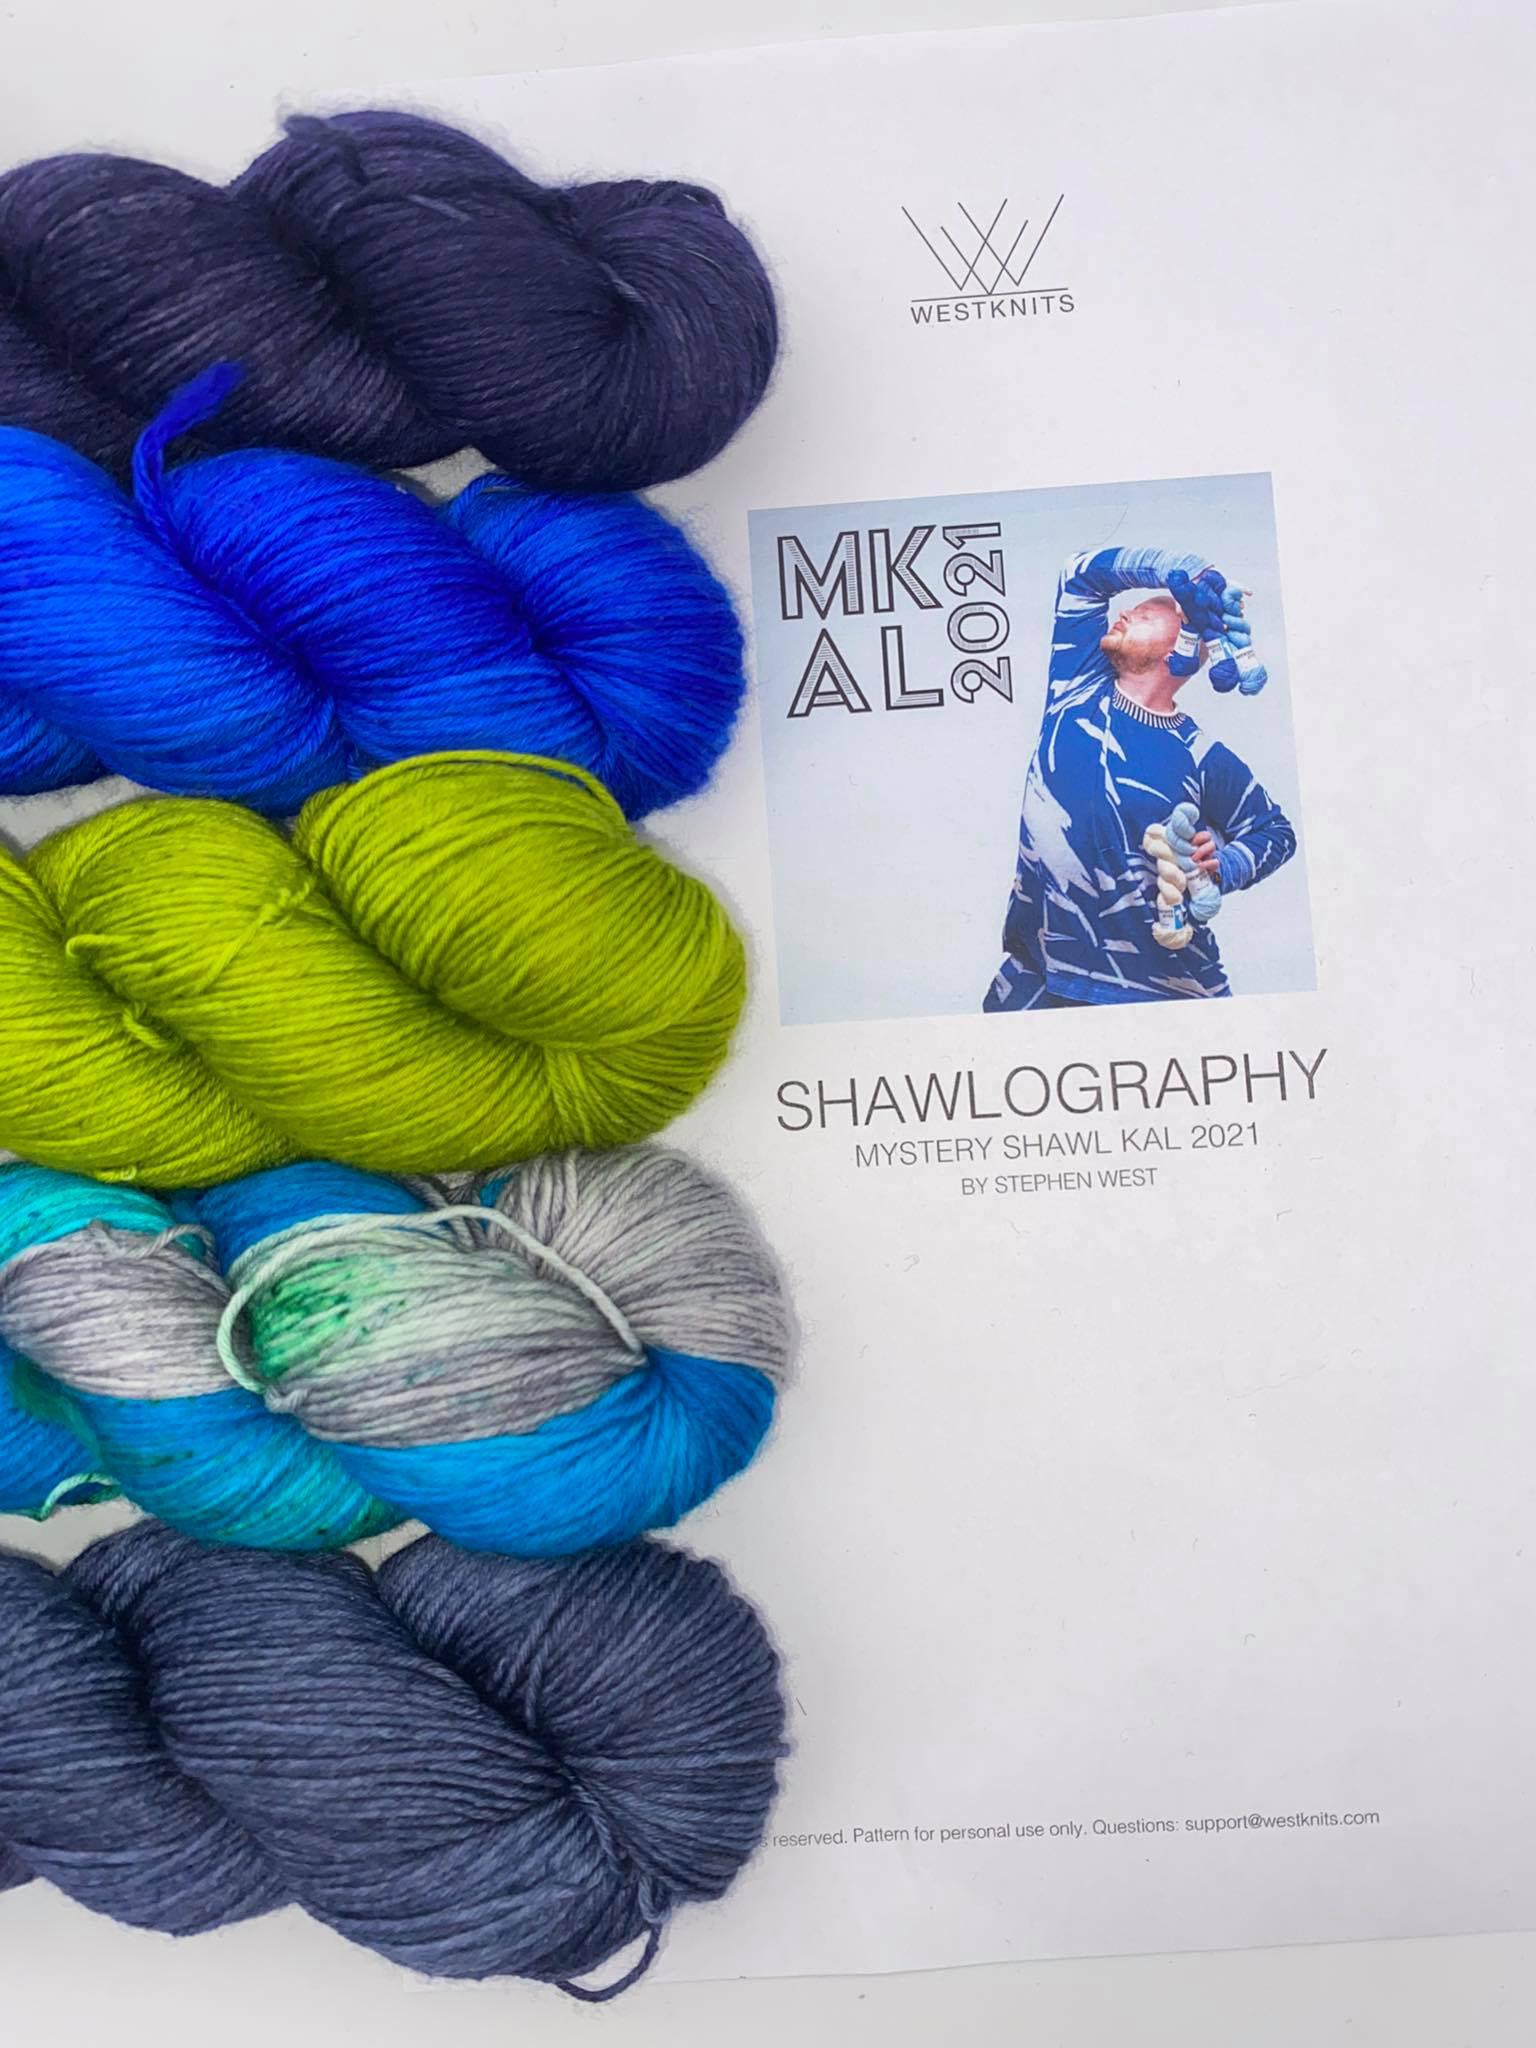 Woll Set Stephen West MKAL Shawlography #18